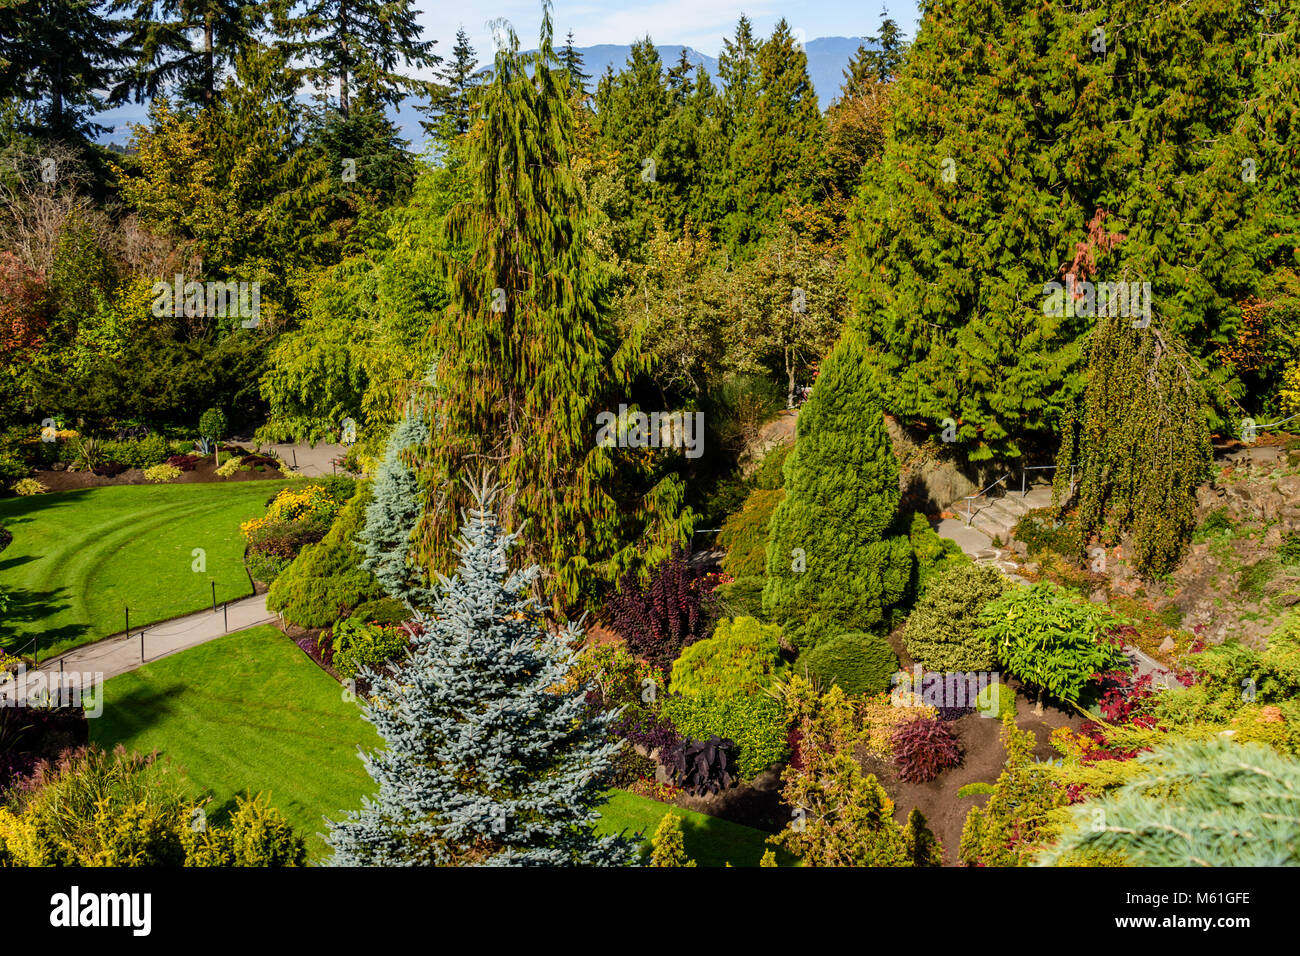 Queen Elizabeth Botanical Garden Stock Photos & Queen Elizabeth ...